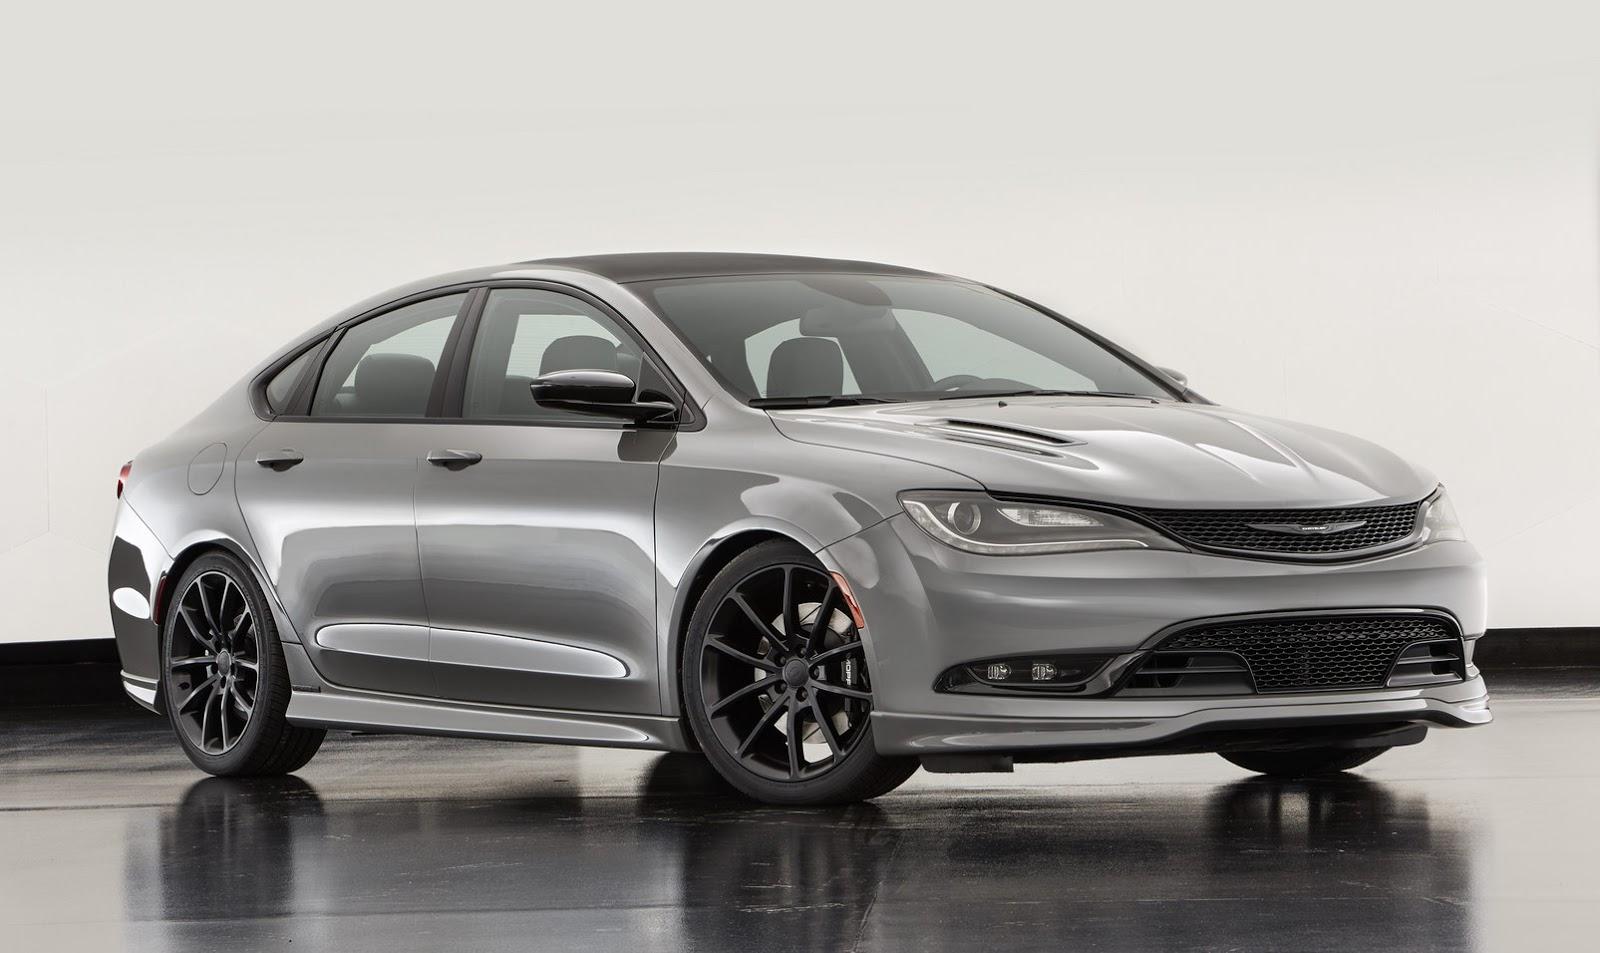 Chrysler Gives 200 S A Mopar Style Attitude Adjustment